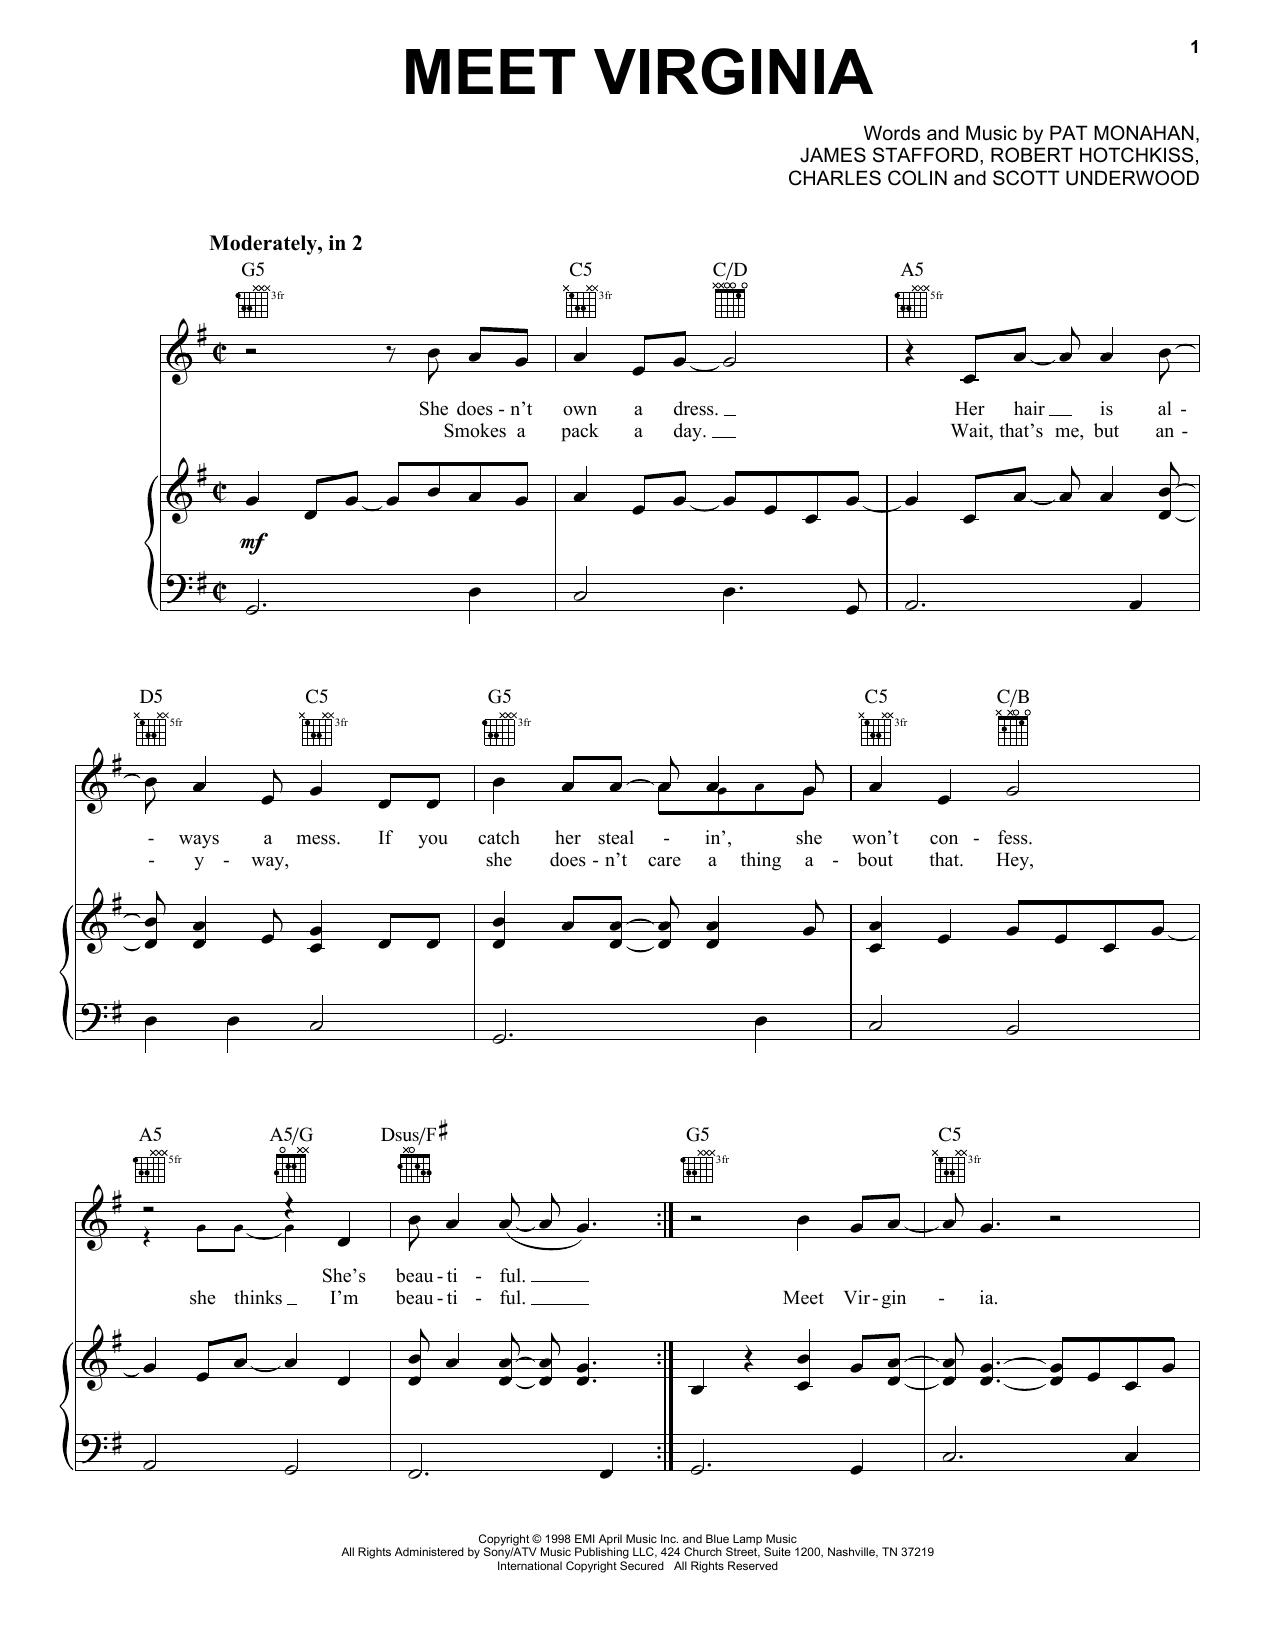 Train Meet Virginia sheet music notes and chords